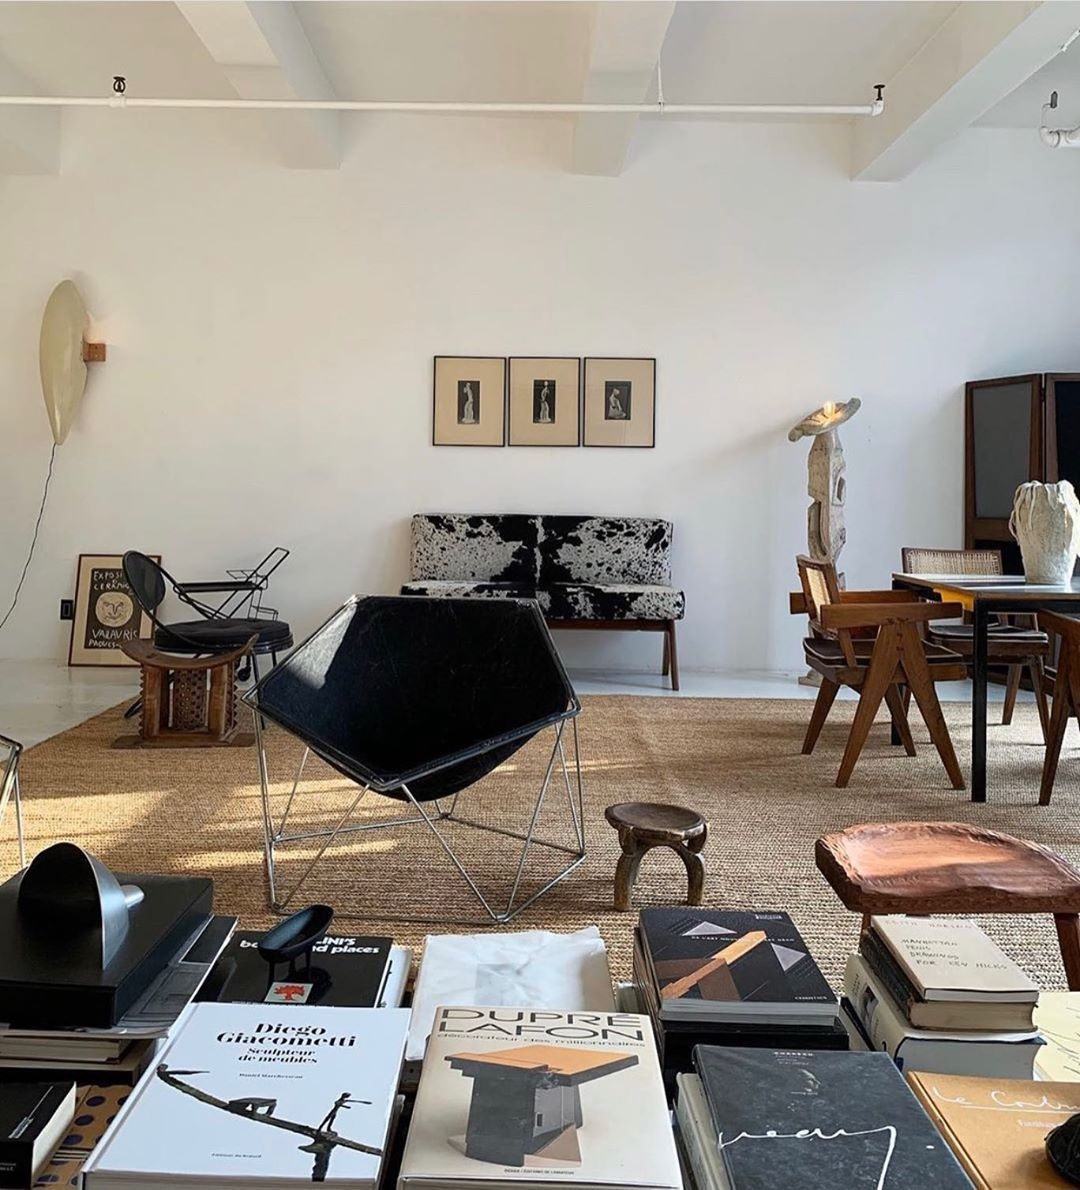 "Jolielot I Marlot   Amsterdam on Instagram: ""A dreamy interior to start the day"""